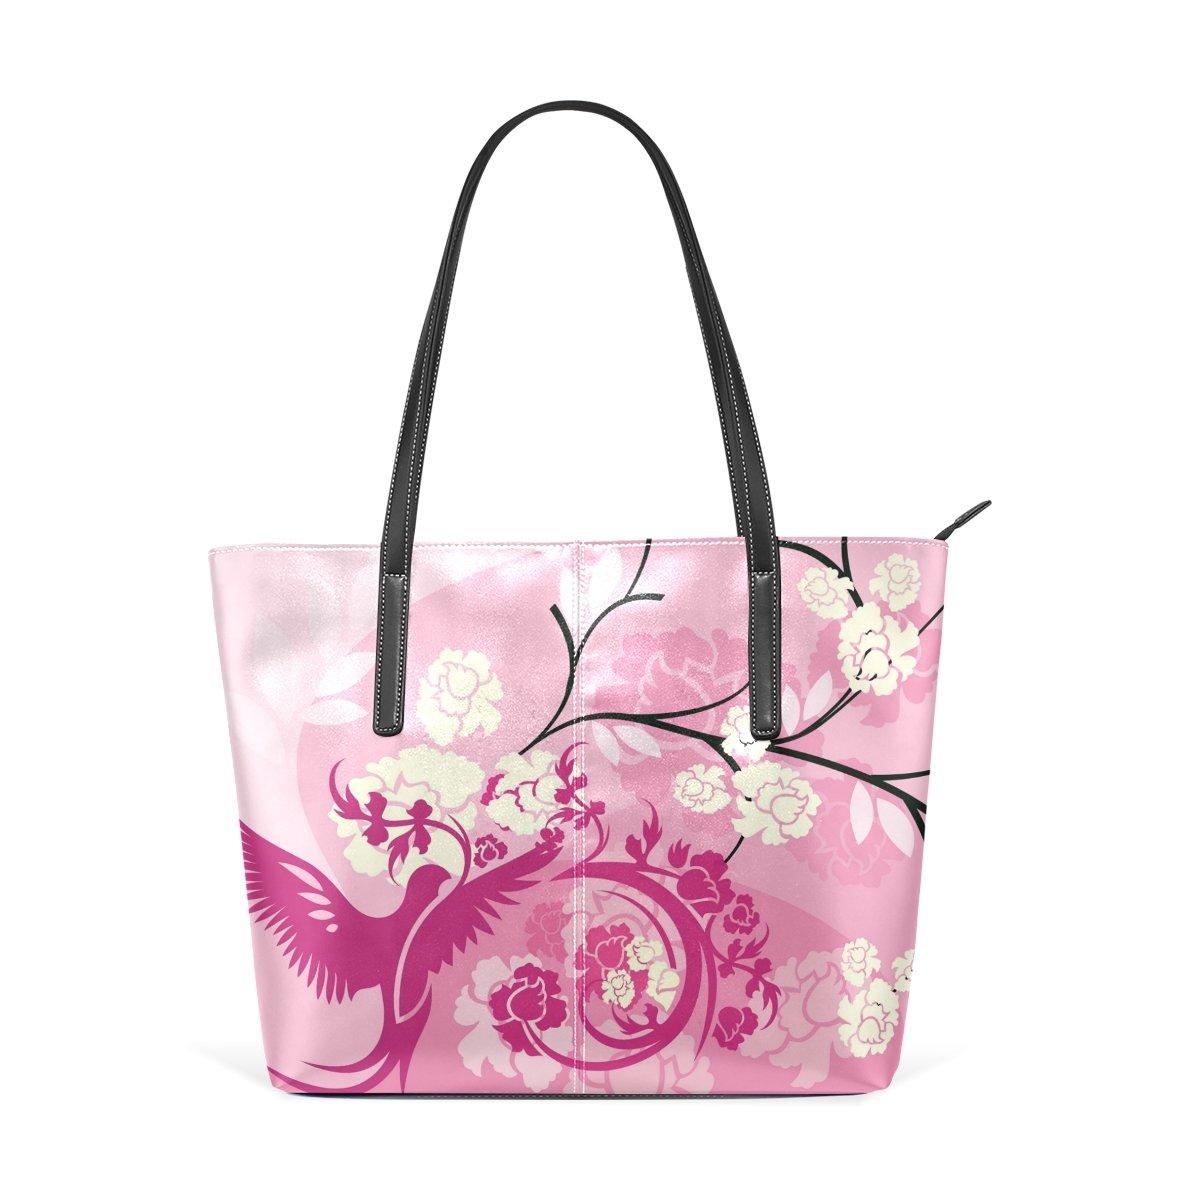 Women Leather Handbags Pink Phenix Top Handle Shoulder Bags